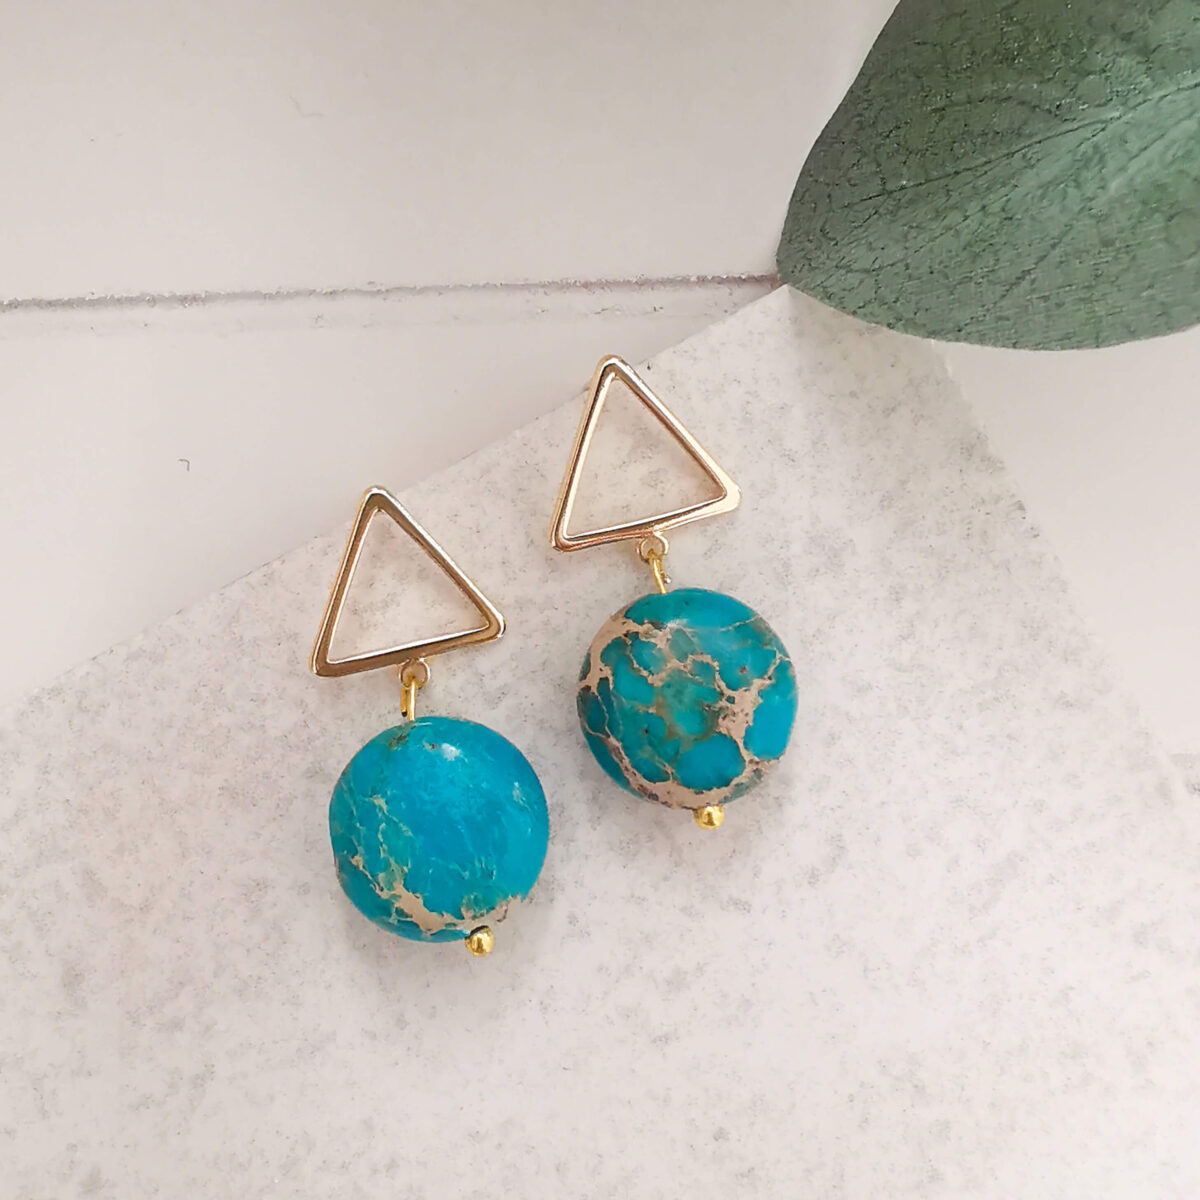 REVA - 18K Gold Plated Unique Turquoise Stone Earrings against plain tile background